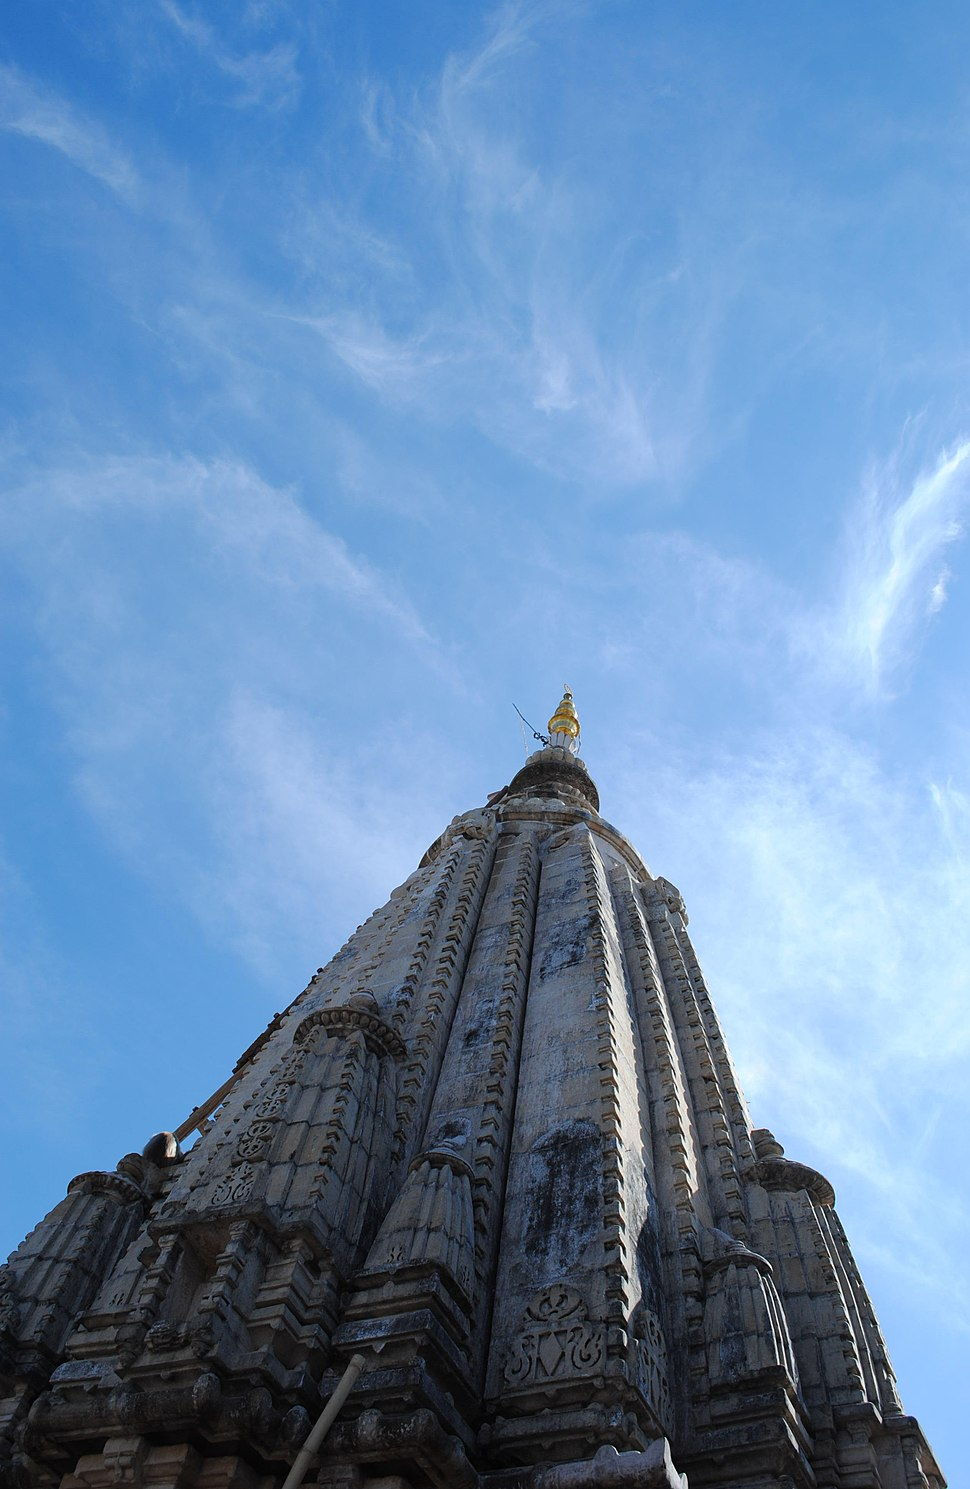 Spire of the main shrine at Ram Temple, Ramtek.